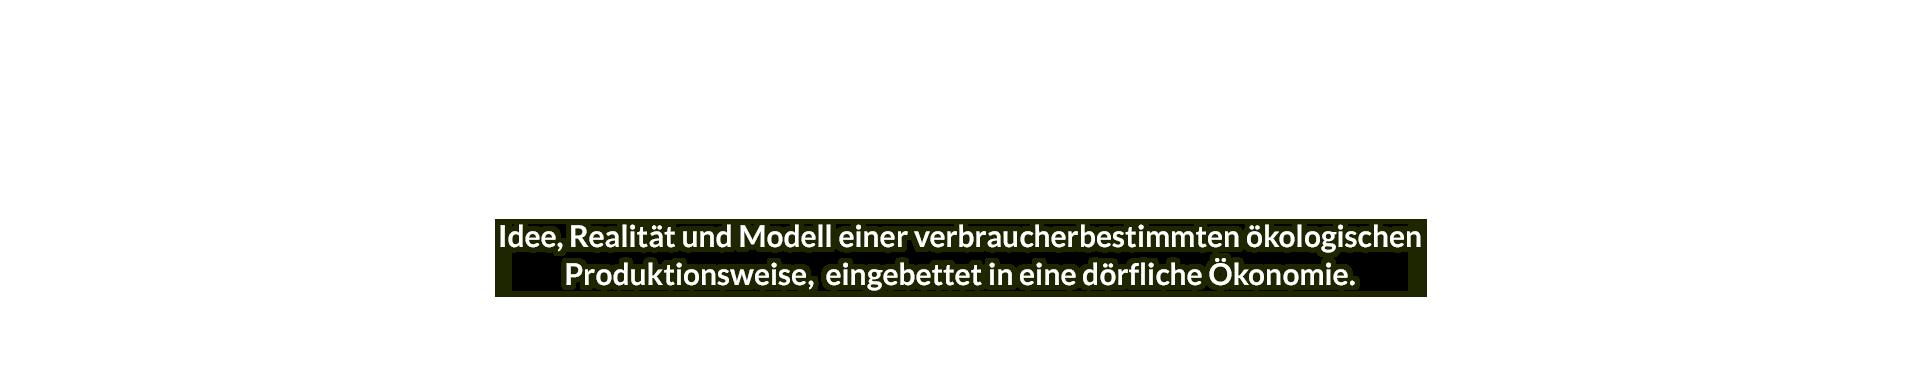 Verein zur Förderung d. ökolog. Landbaus u. d. Landschaftspflege Reetz e.V.